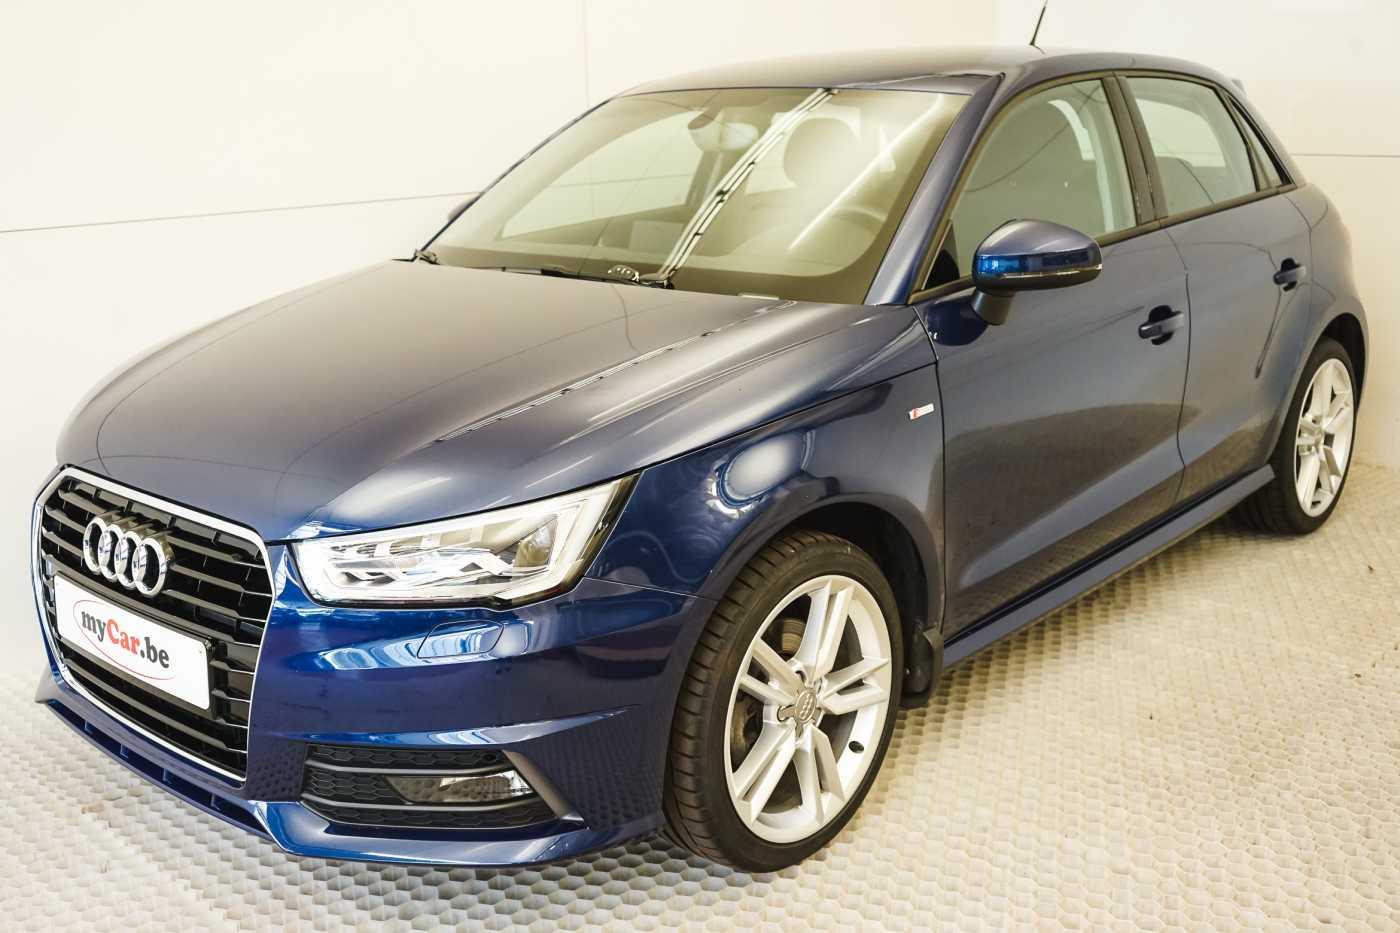 Audi A1 Proline Admired S-Line // Bluetooth, Zetelverwarming, Airco 3/31